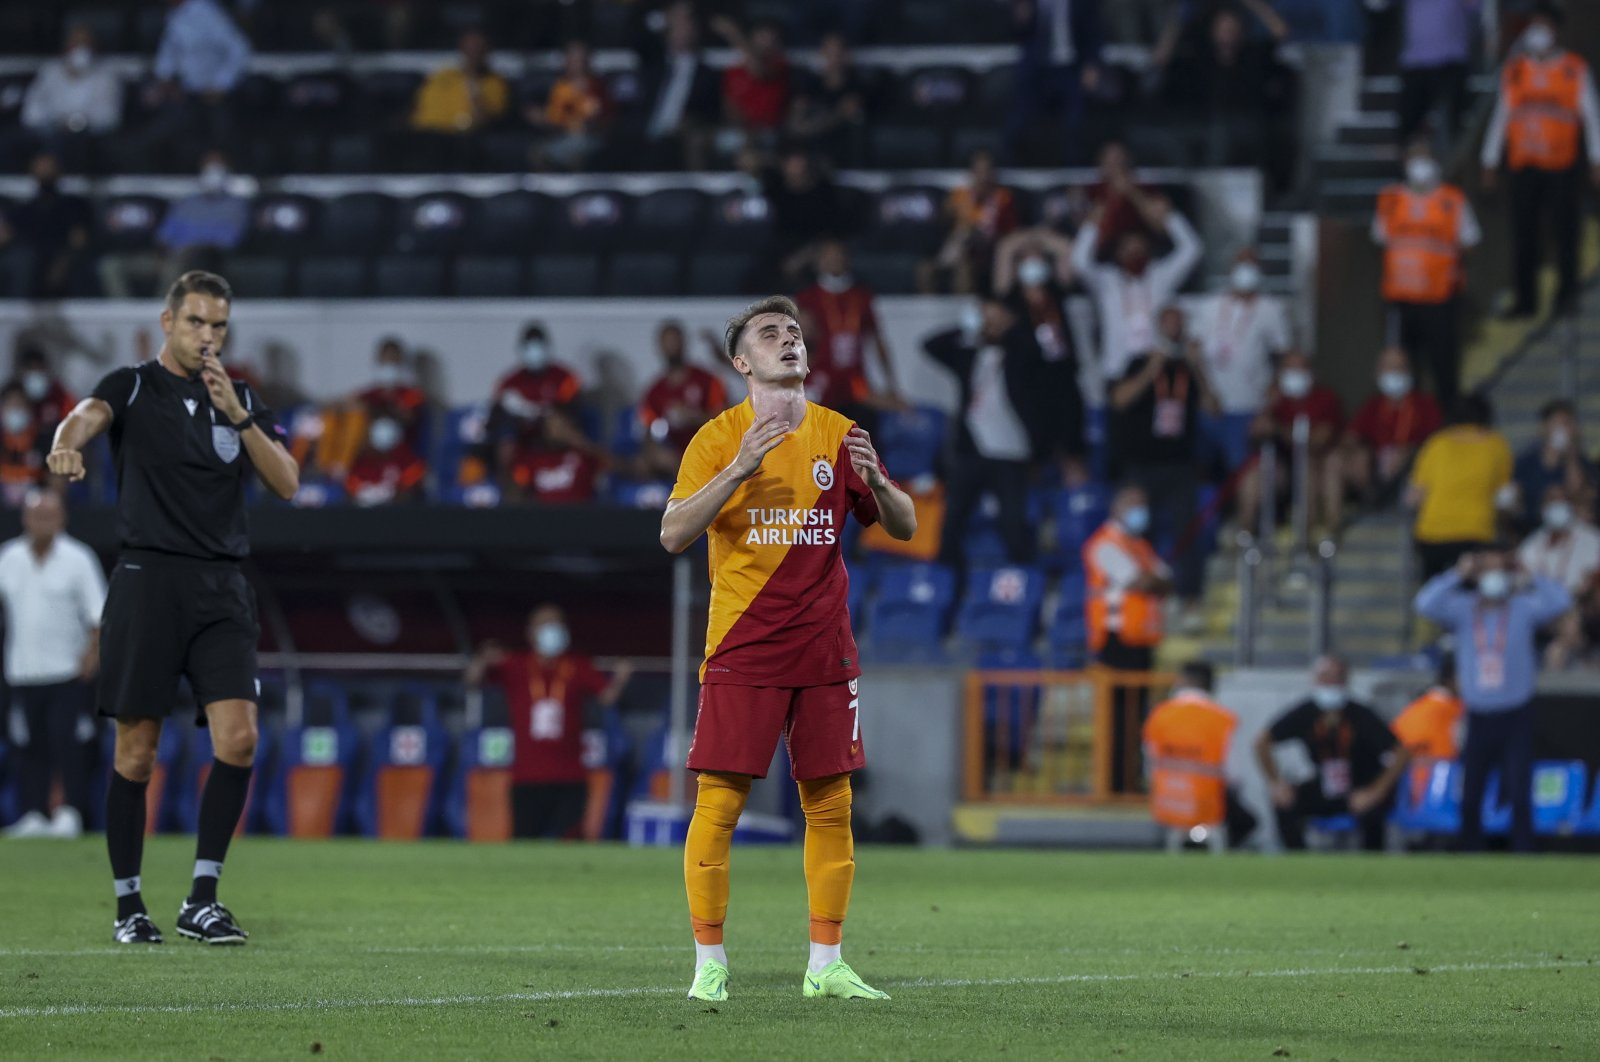 Galatasaray's Kerem Aktürkoğlu looks dejected during the UEFA Europa League third qualifying round match against Scotland's St. Johnstone, Istanbul, Turkey, Aug. 5, 2021. (AA Photo)